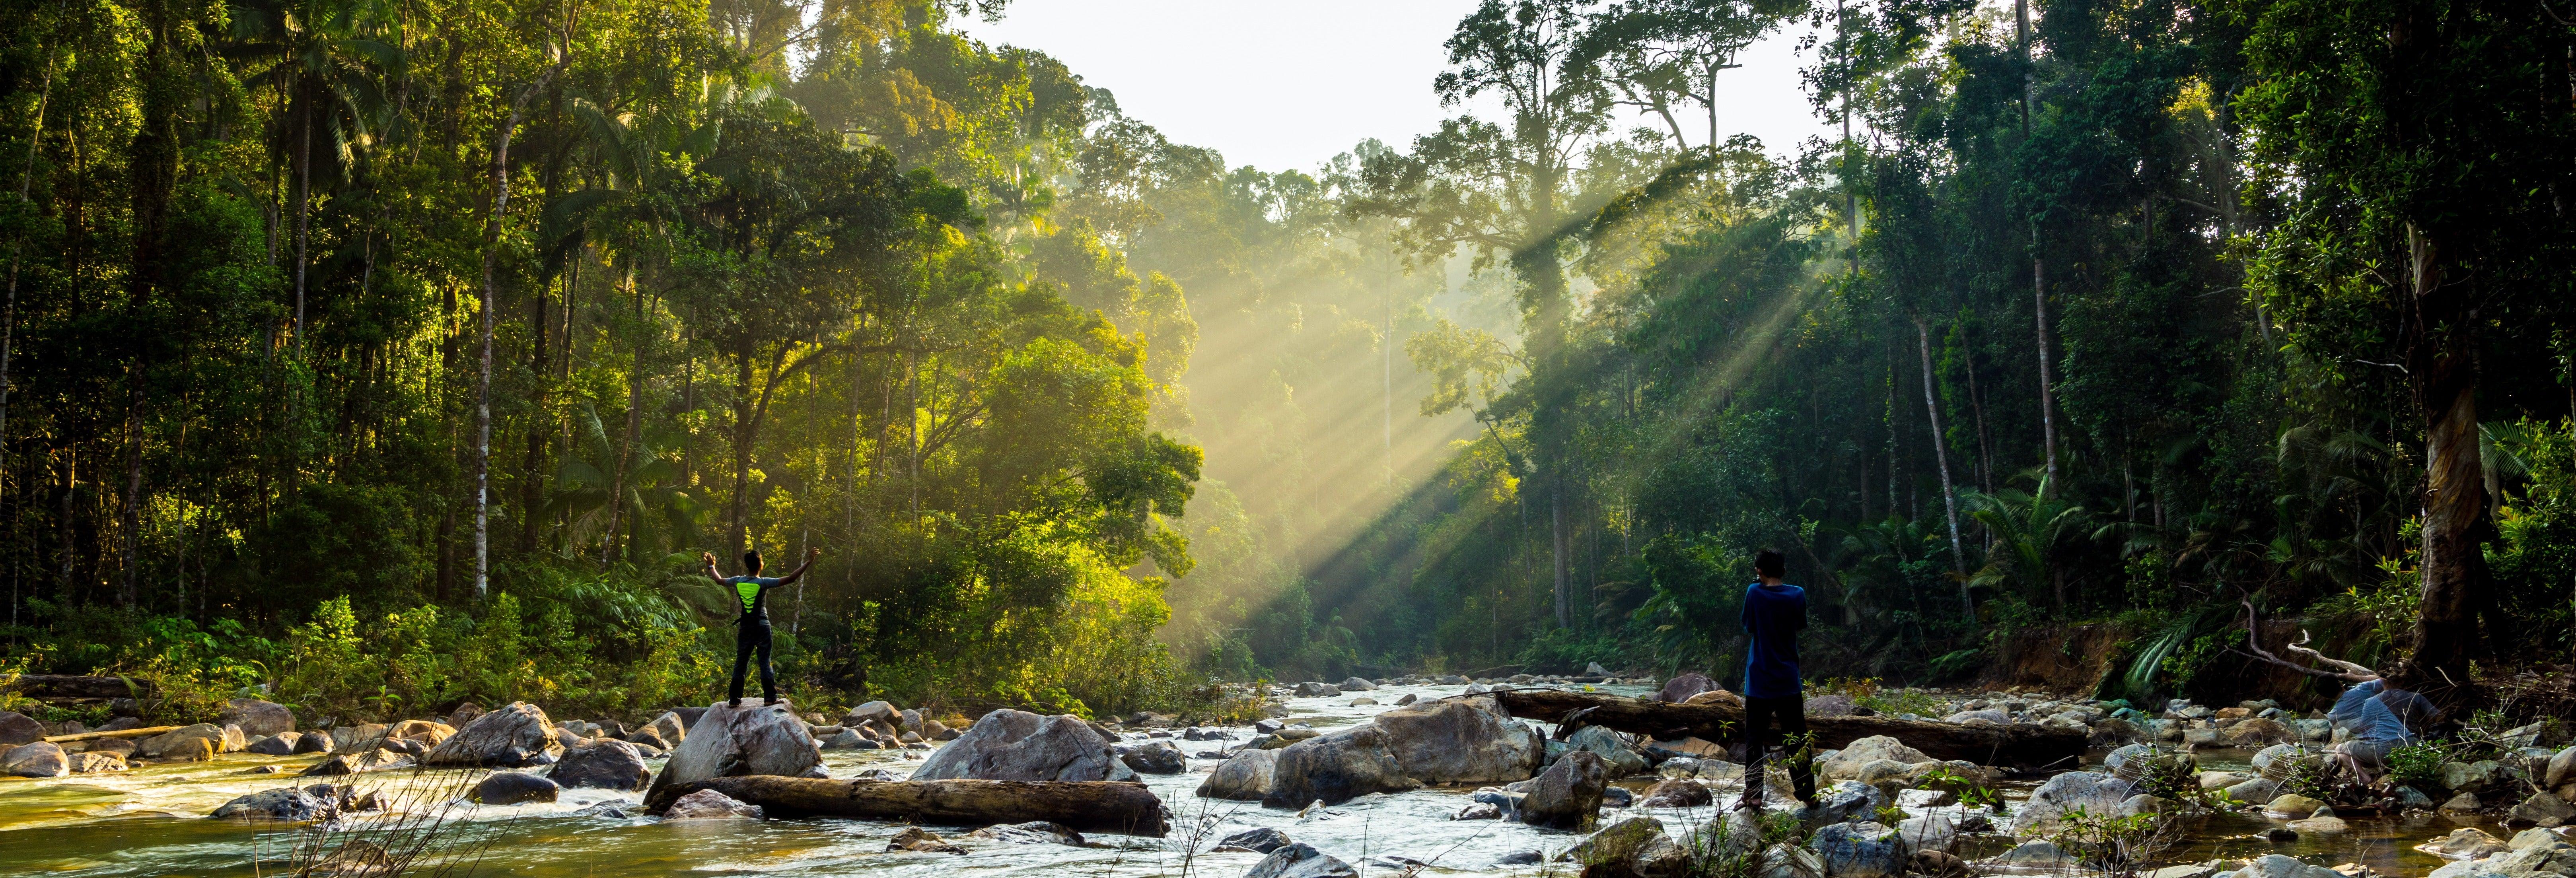 Excursion dans la jungle Taman Negara